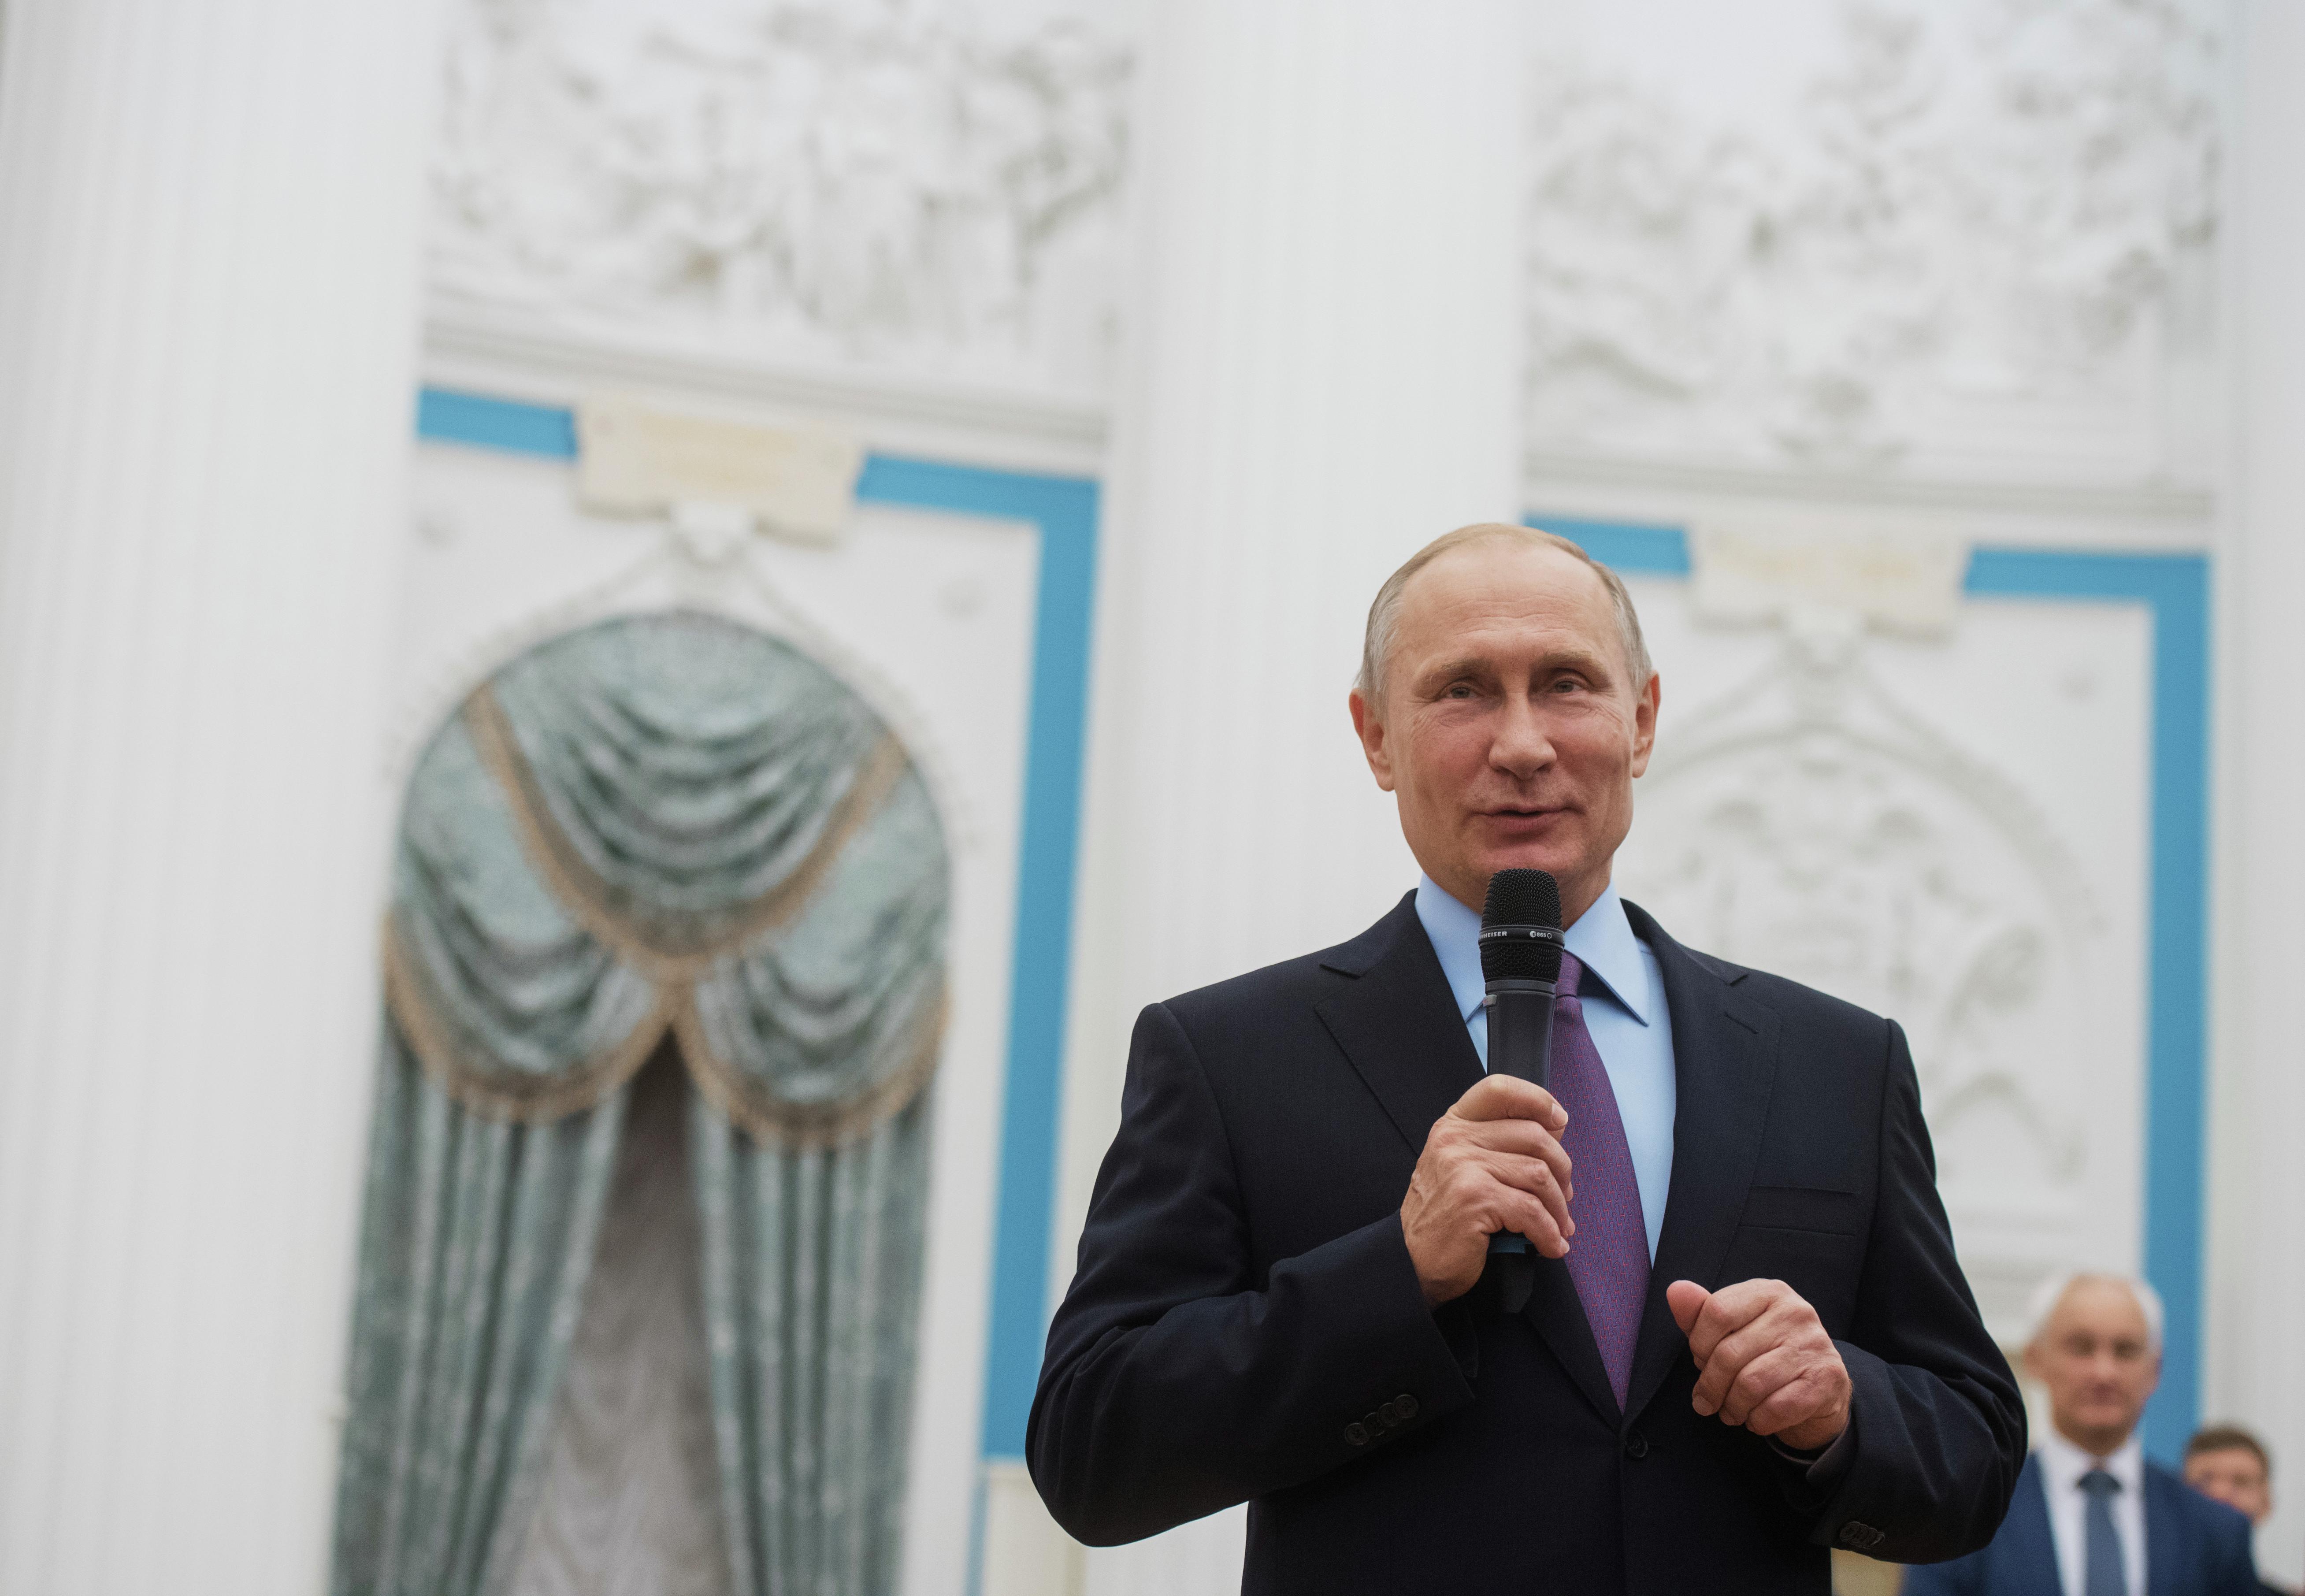 <p>Президент РФ Владимир Путин. Фото: &copy;РИА Новости/Сергей Гунеев</p>